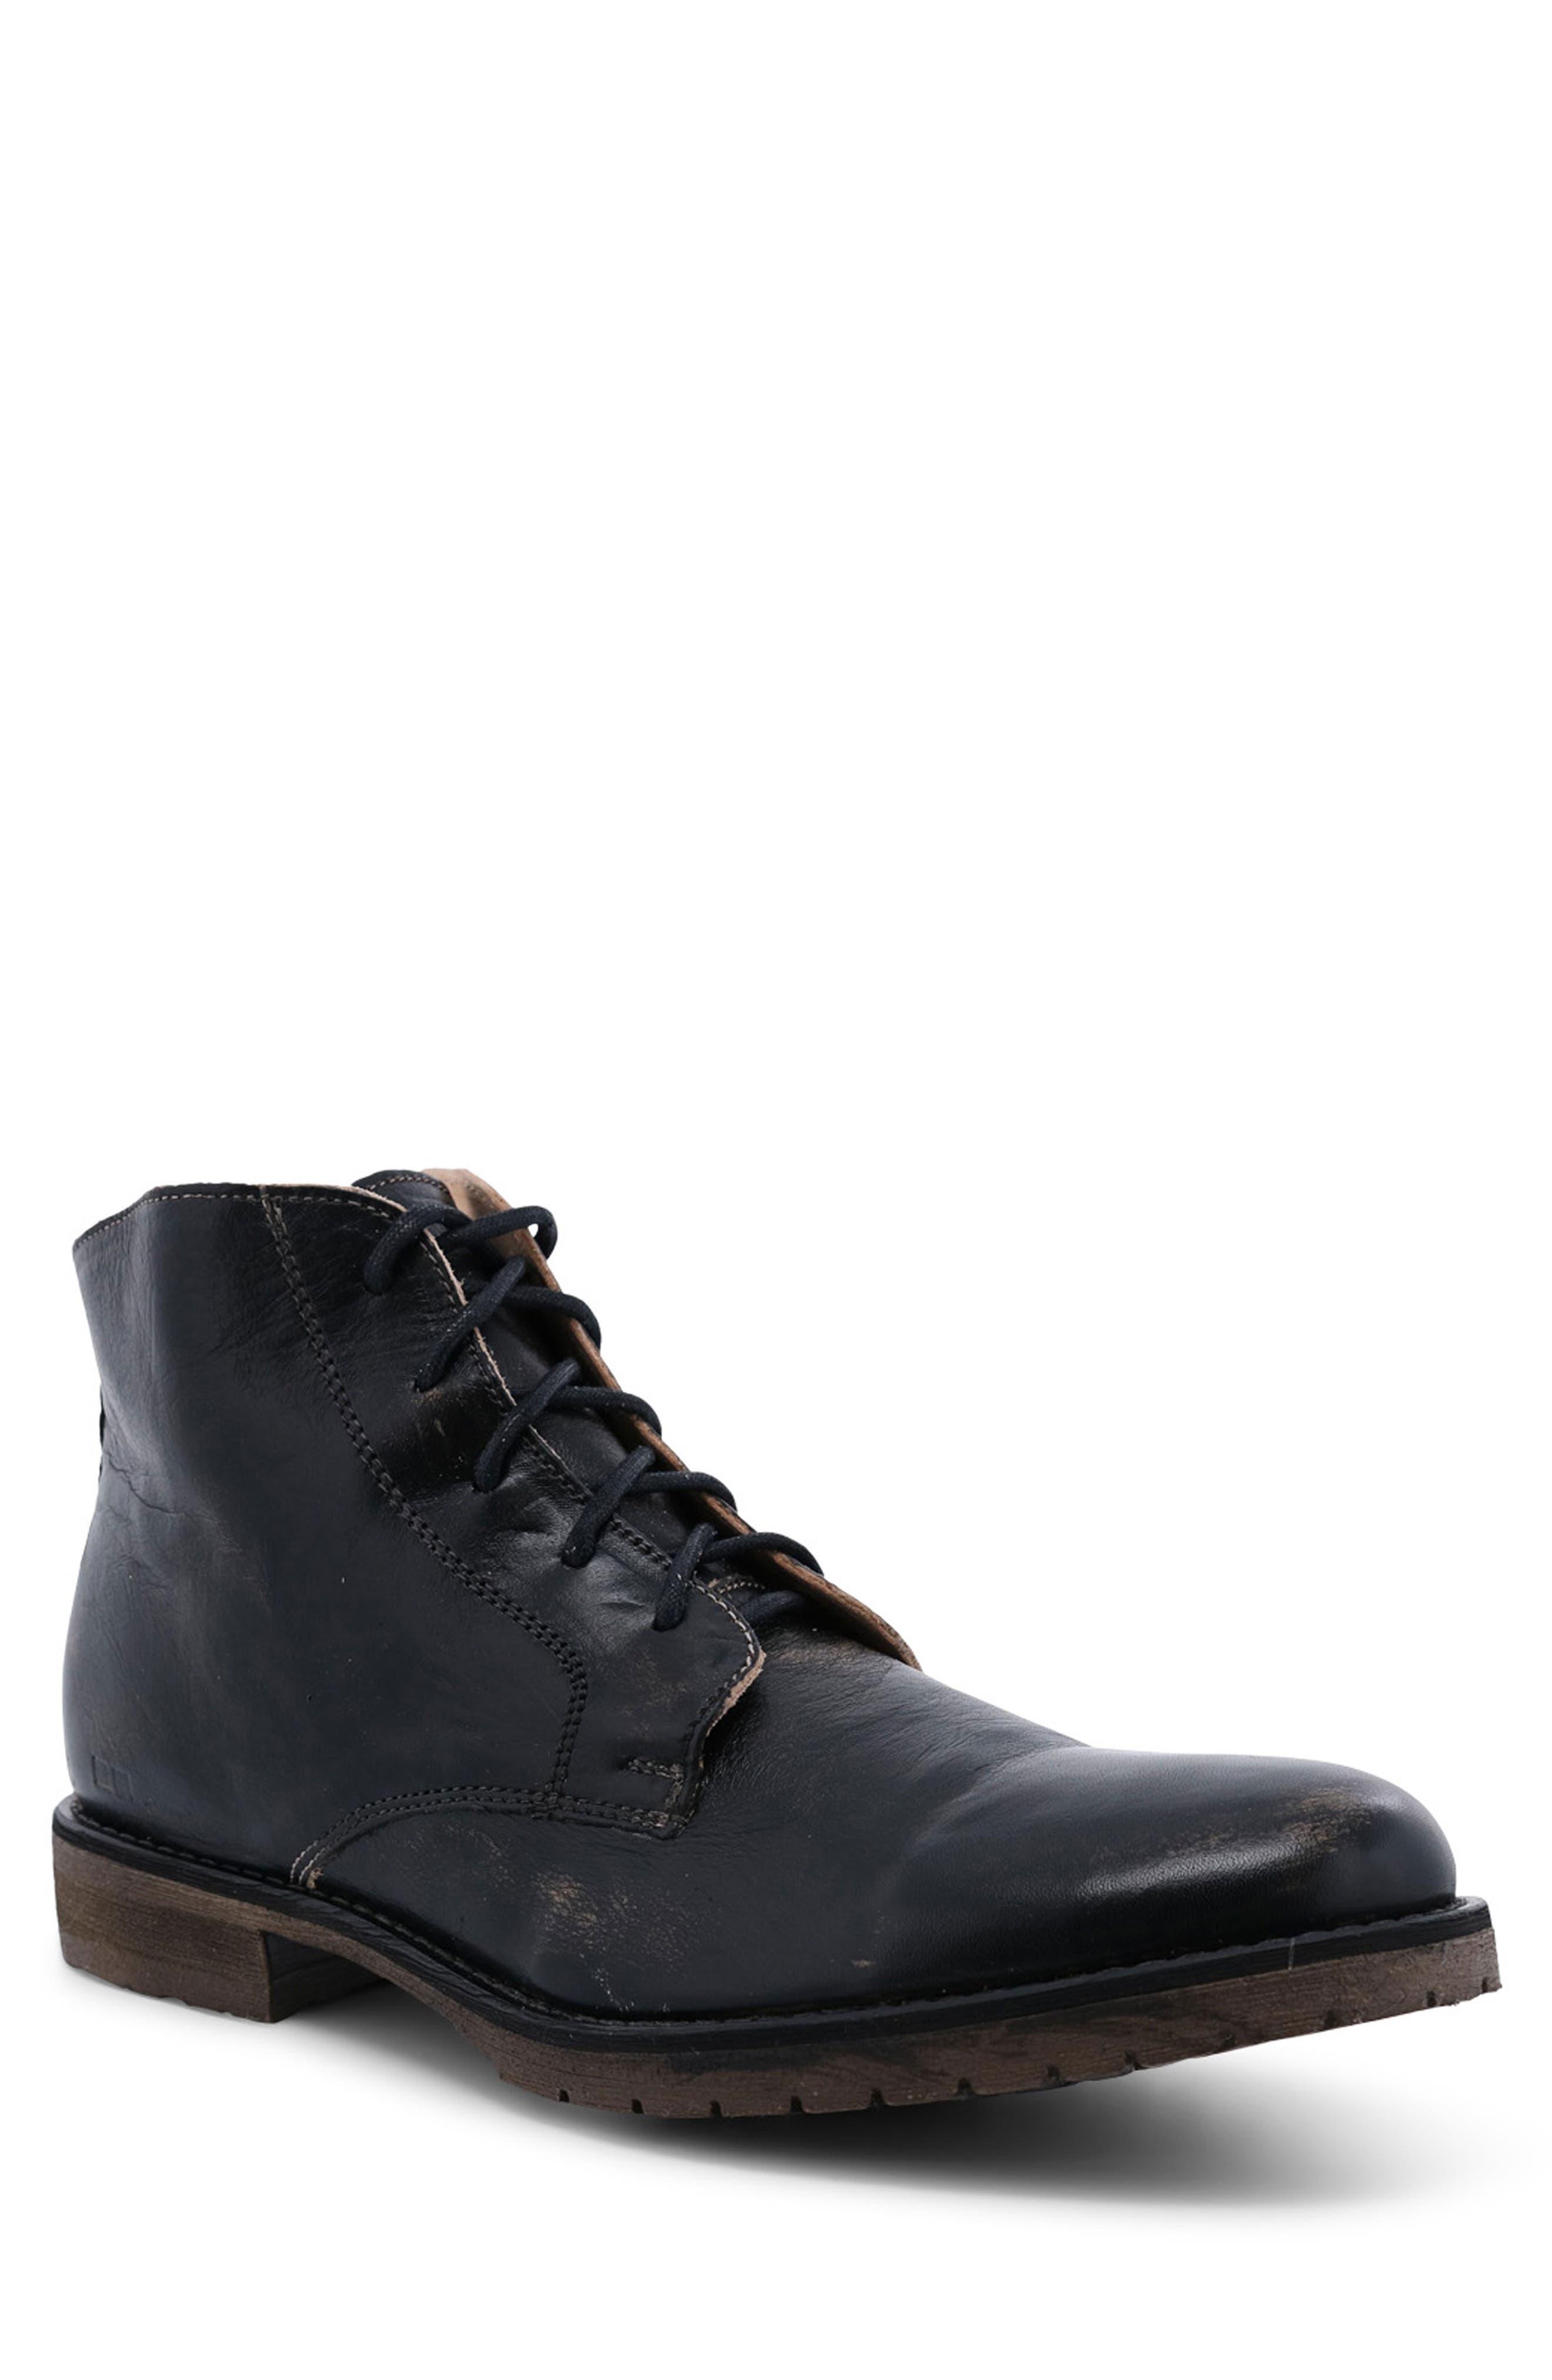 Hoover Ii Plain Toe Boot